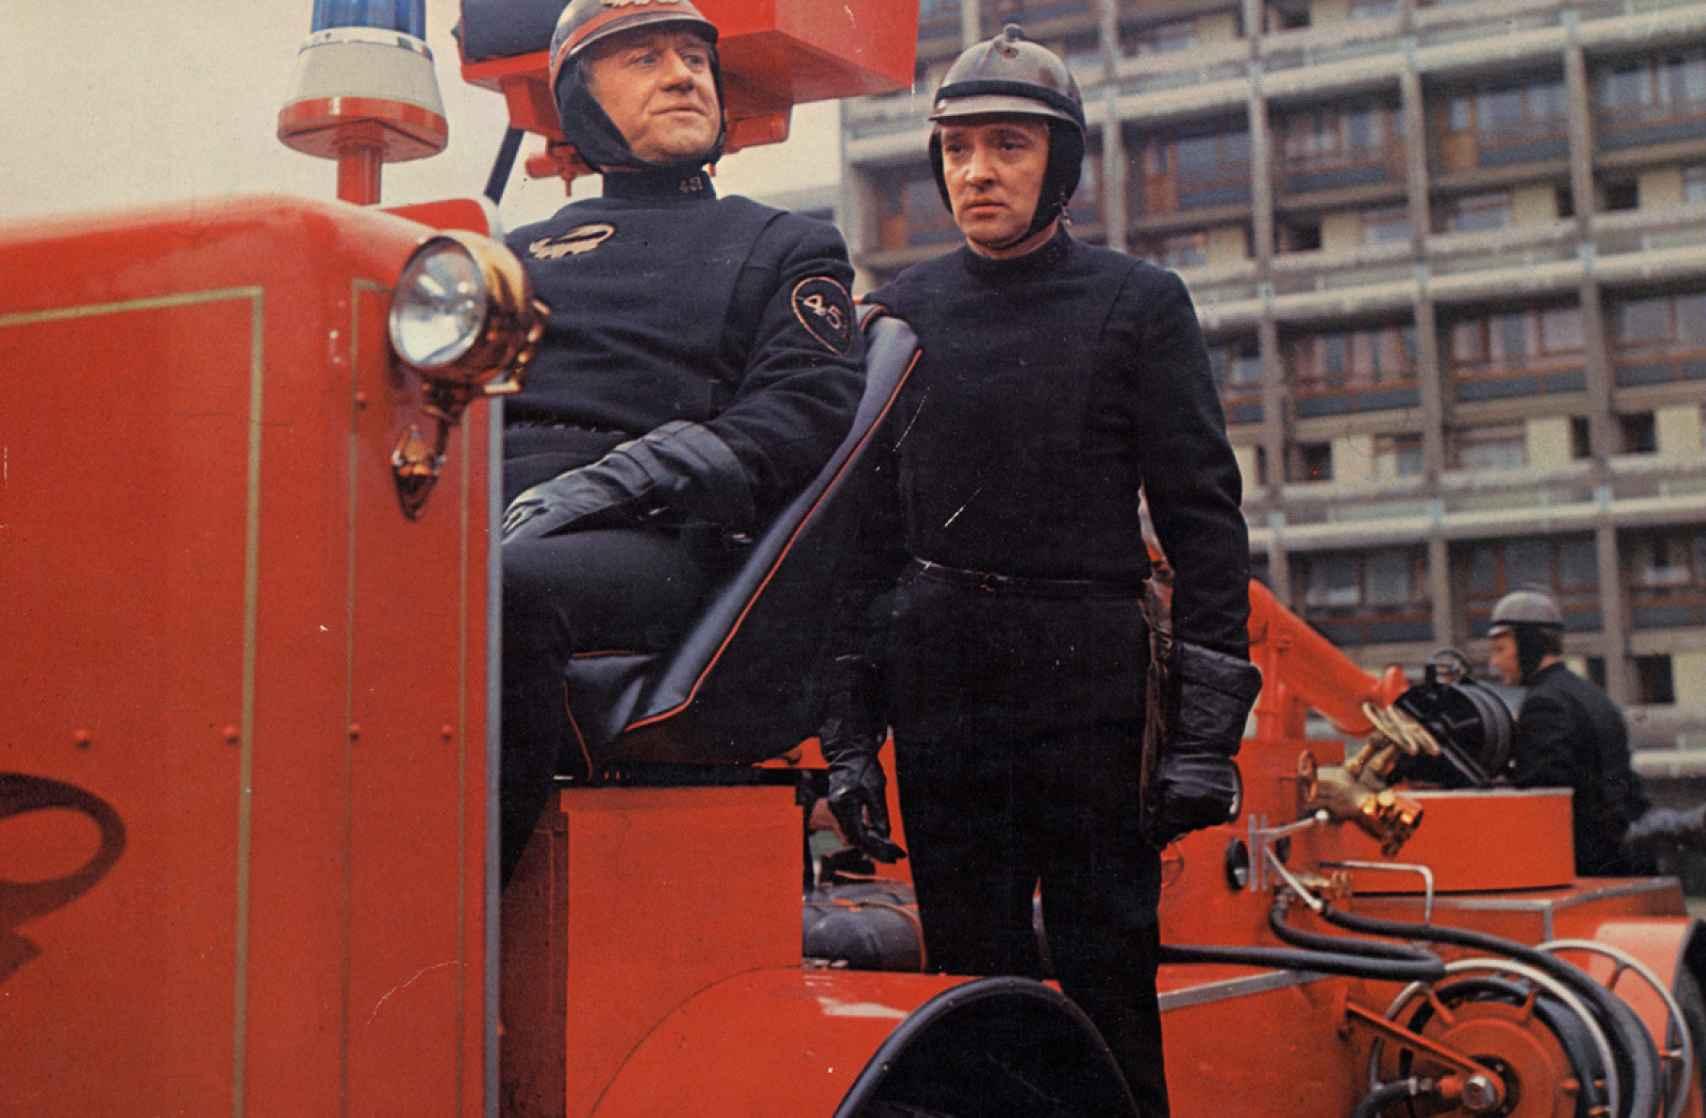 Escena de la película Farenheit 451, de 1966, de François Truffaut.